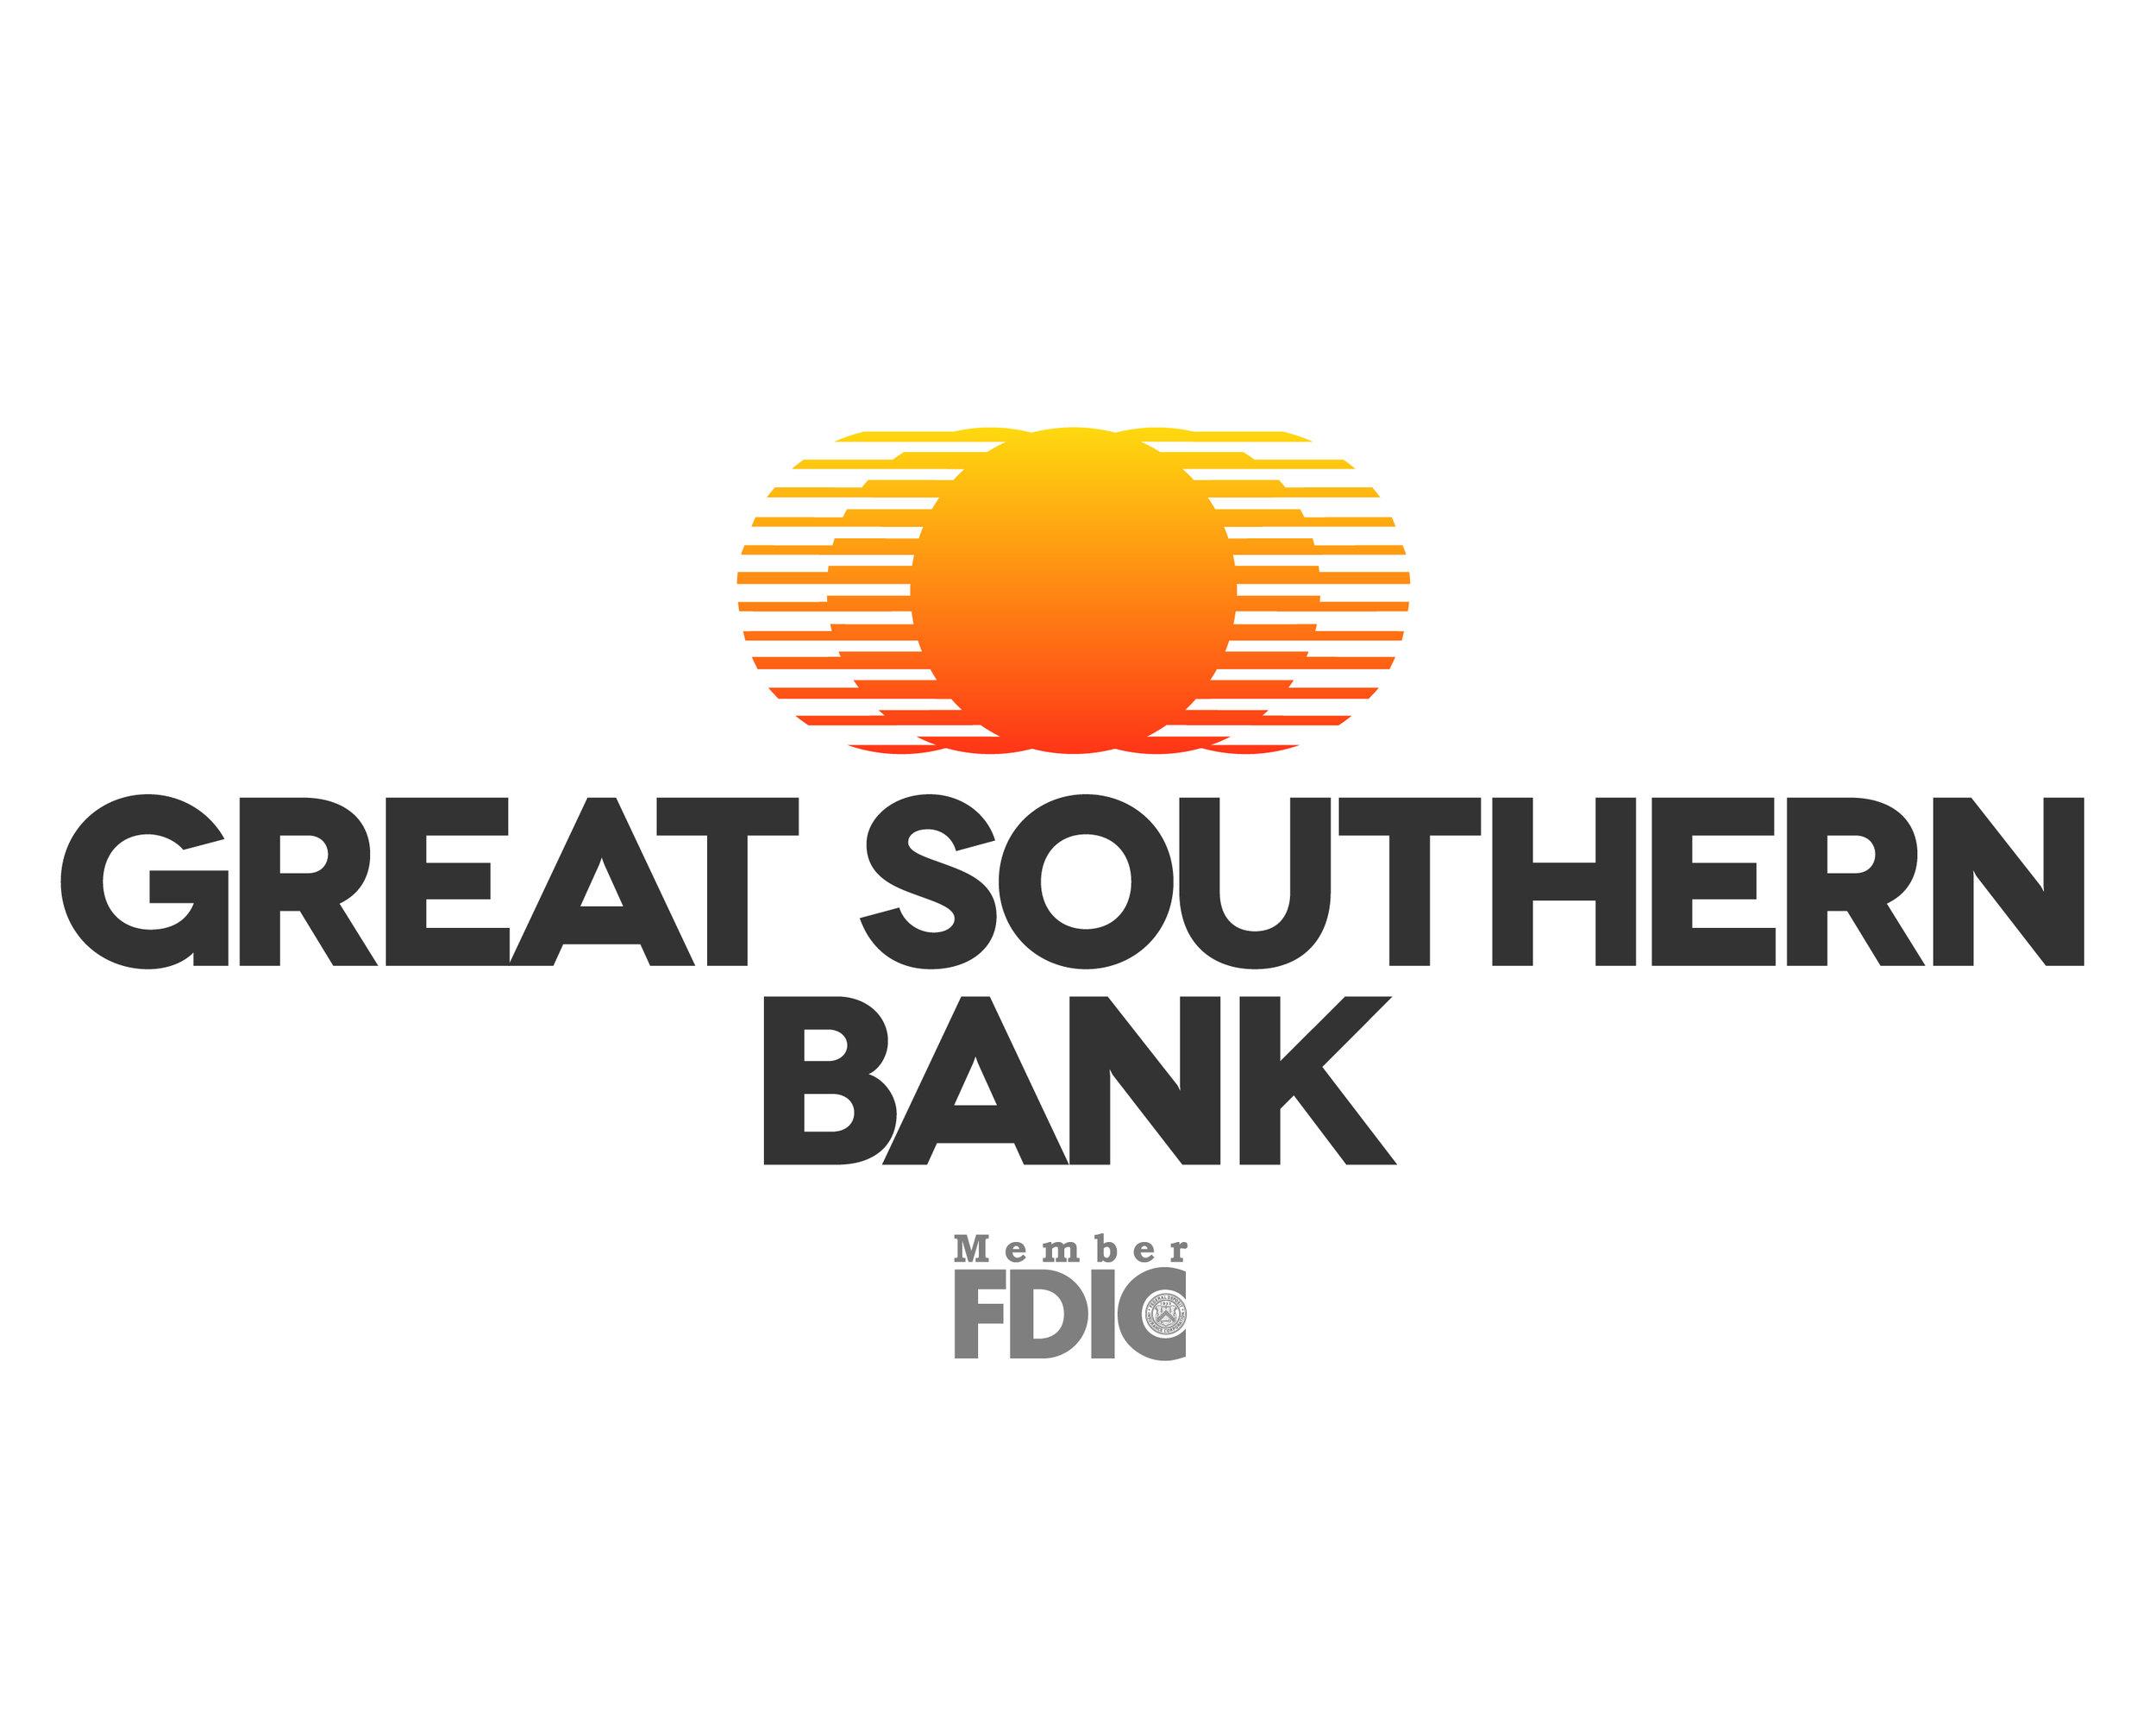 GS FDIC Logo.jpg